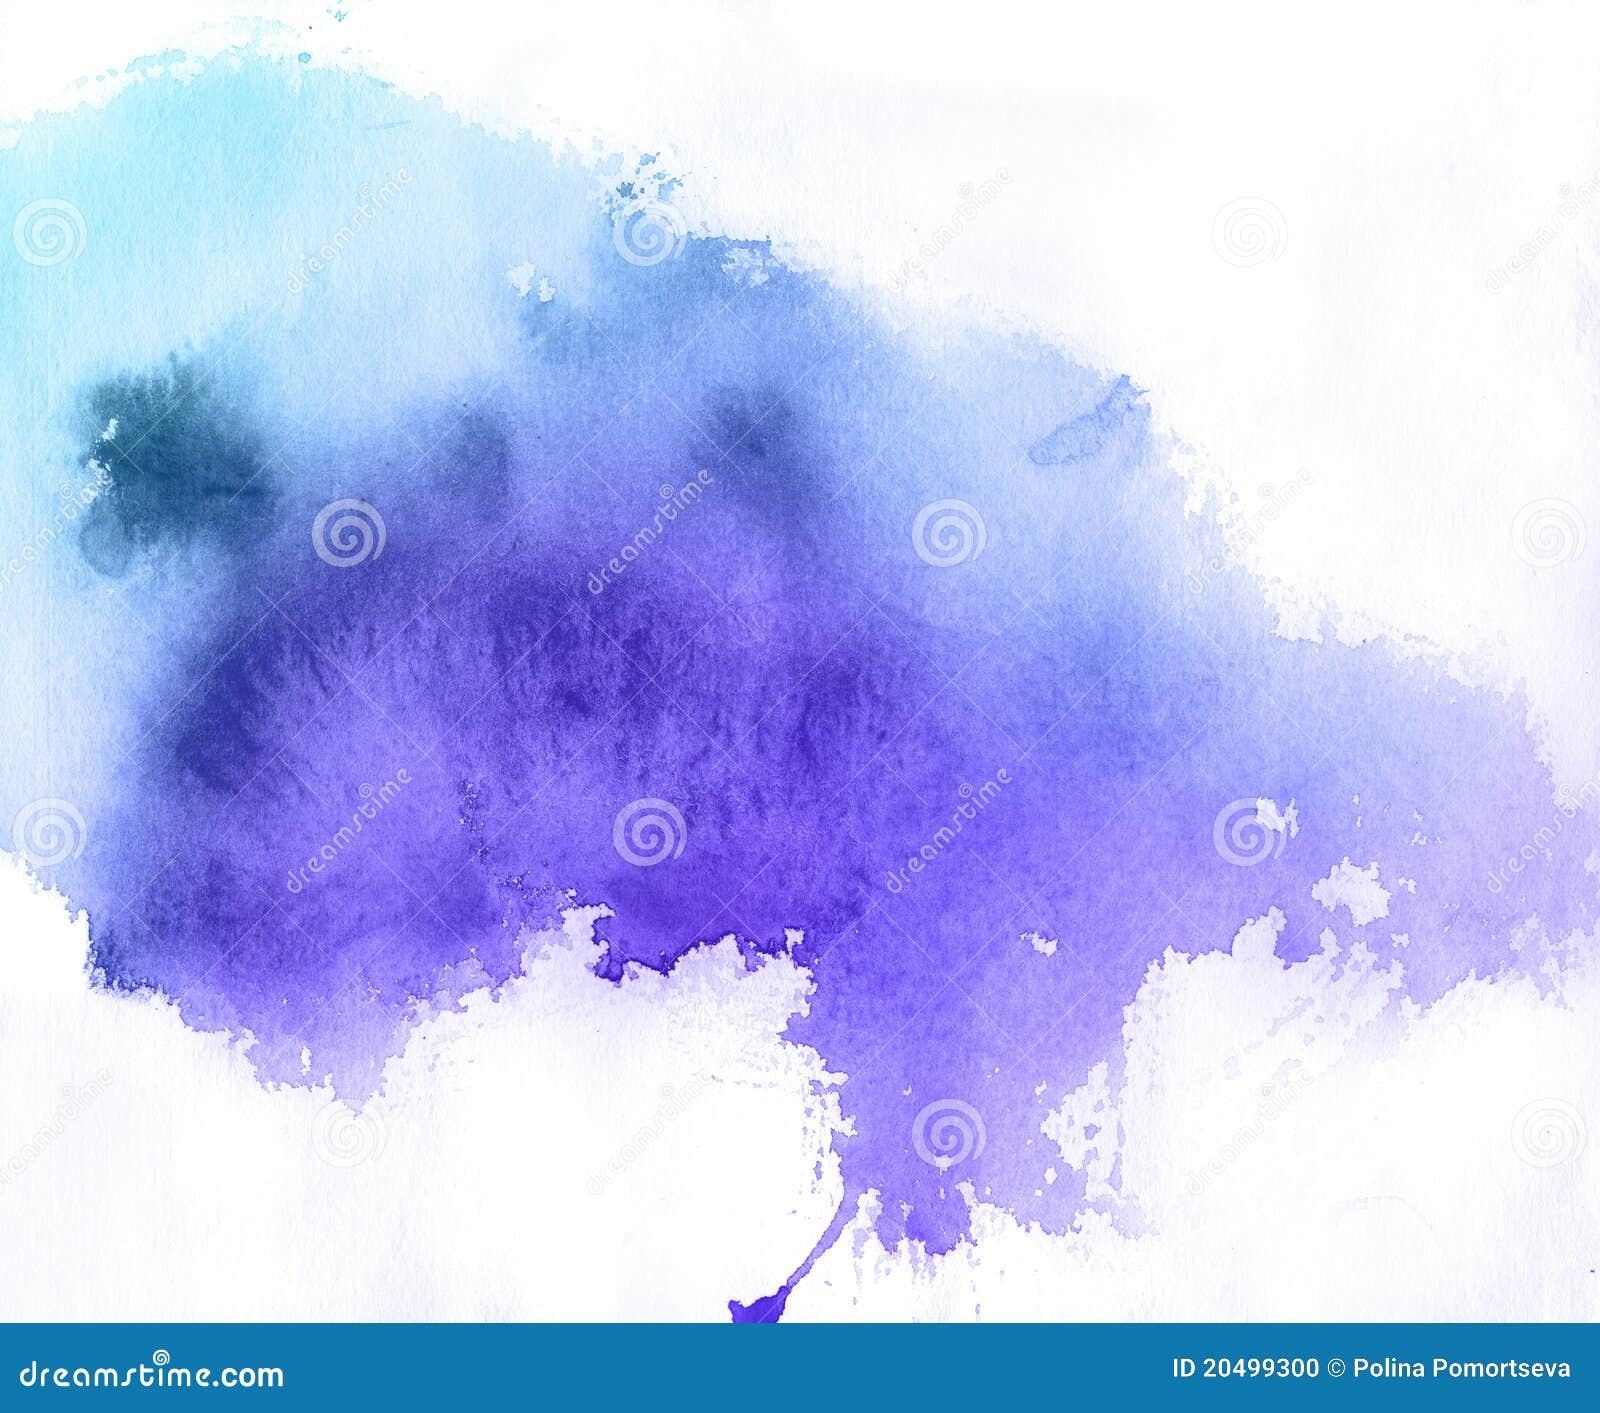 Blue spot, watercolor background